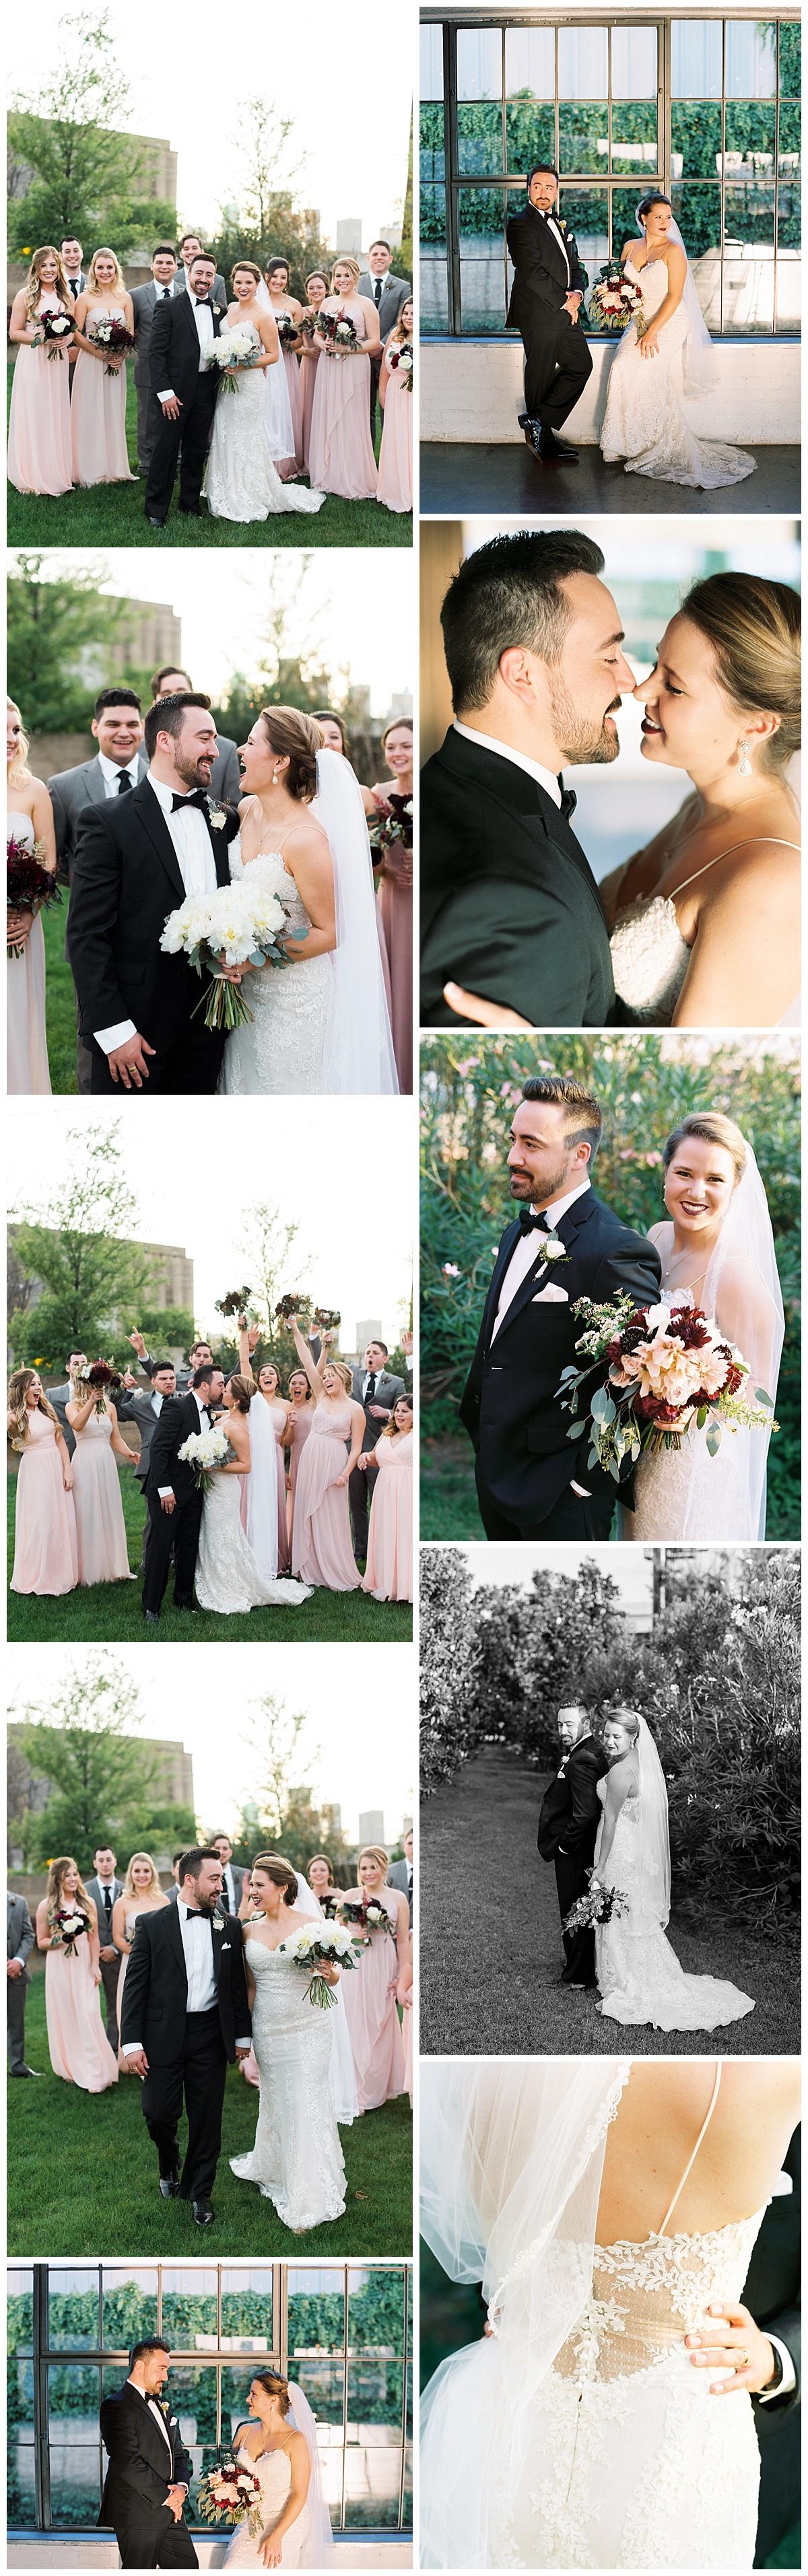 hickory-stree-annex-wedding-ar-photography-nicole-nolan-12.jpg